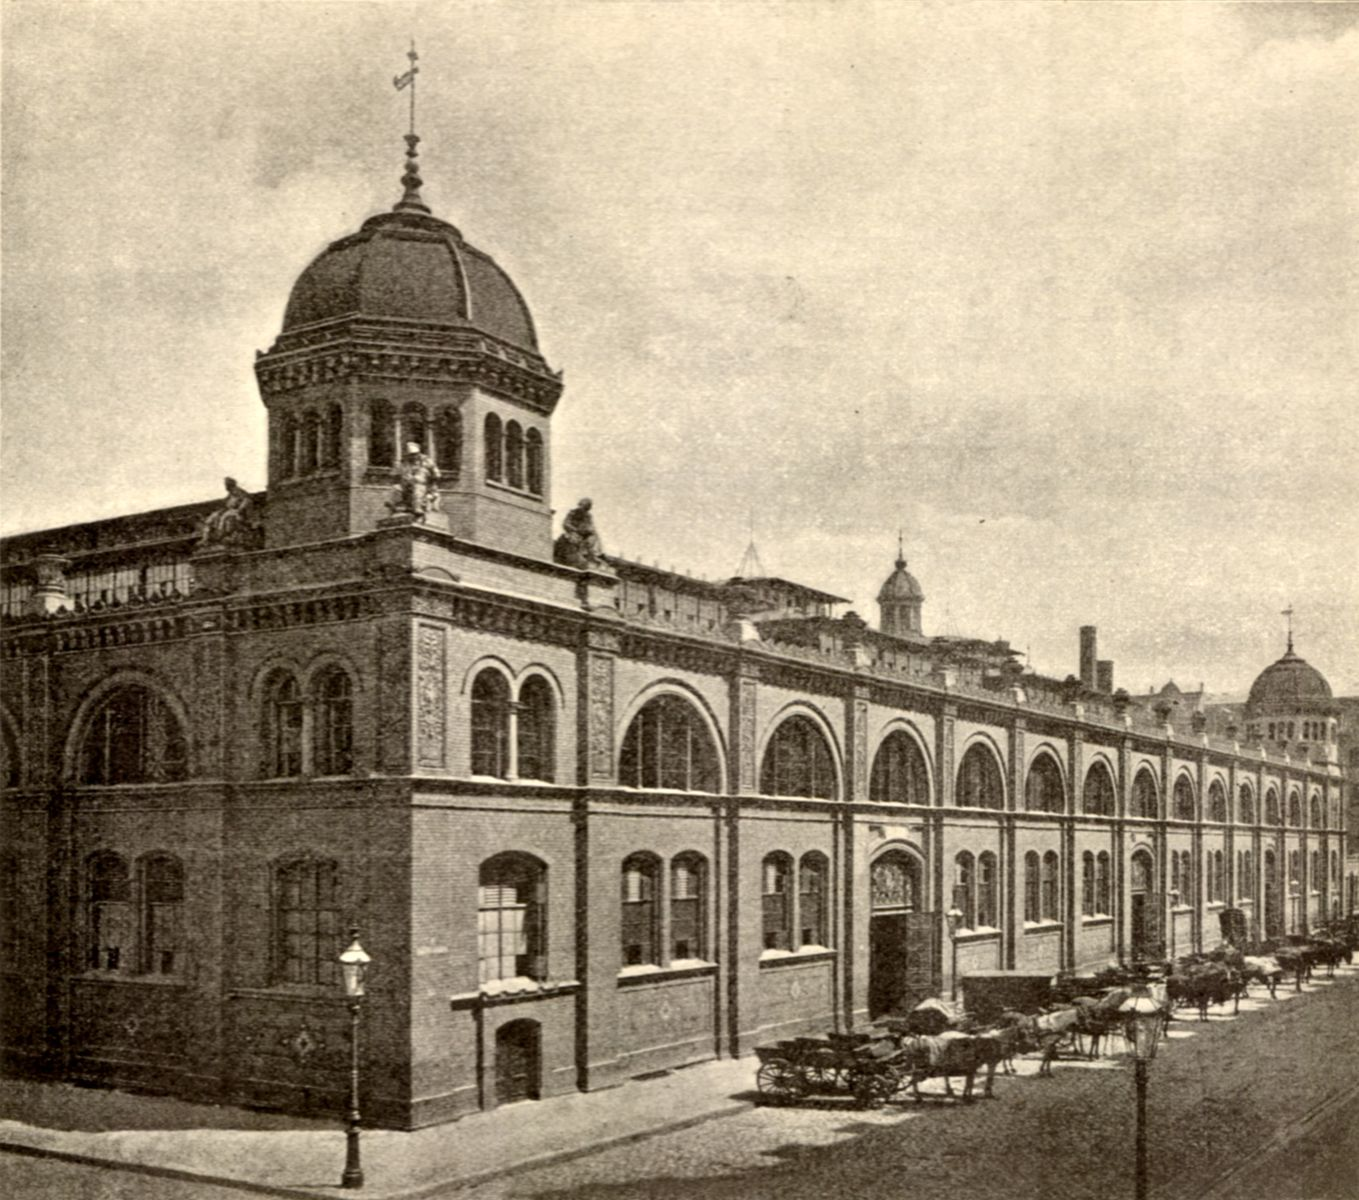 Berlin_Zentralmarkthalle_1896.jpg